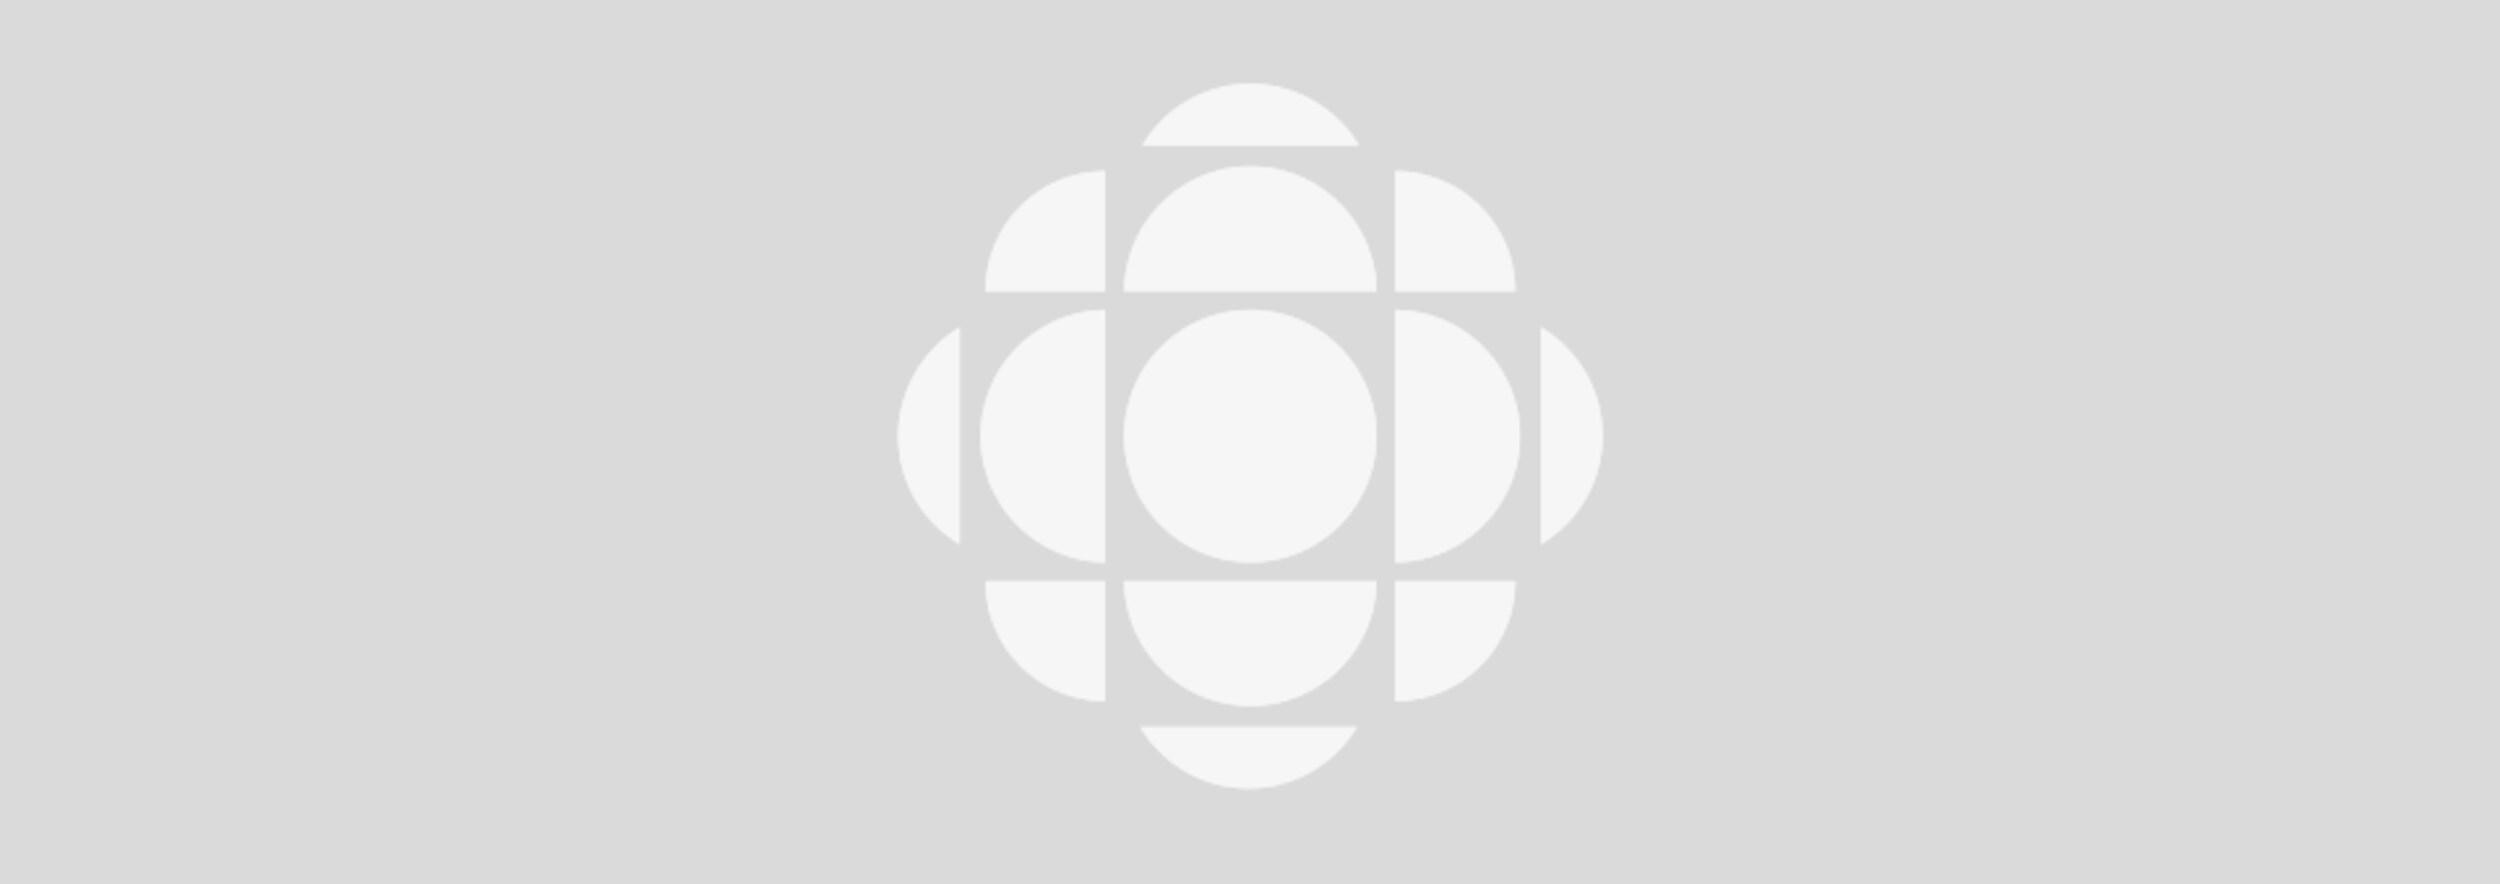 Logo de Radio-Canada centré sur un fond blanc